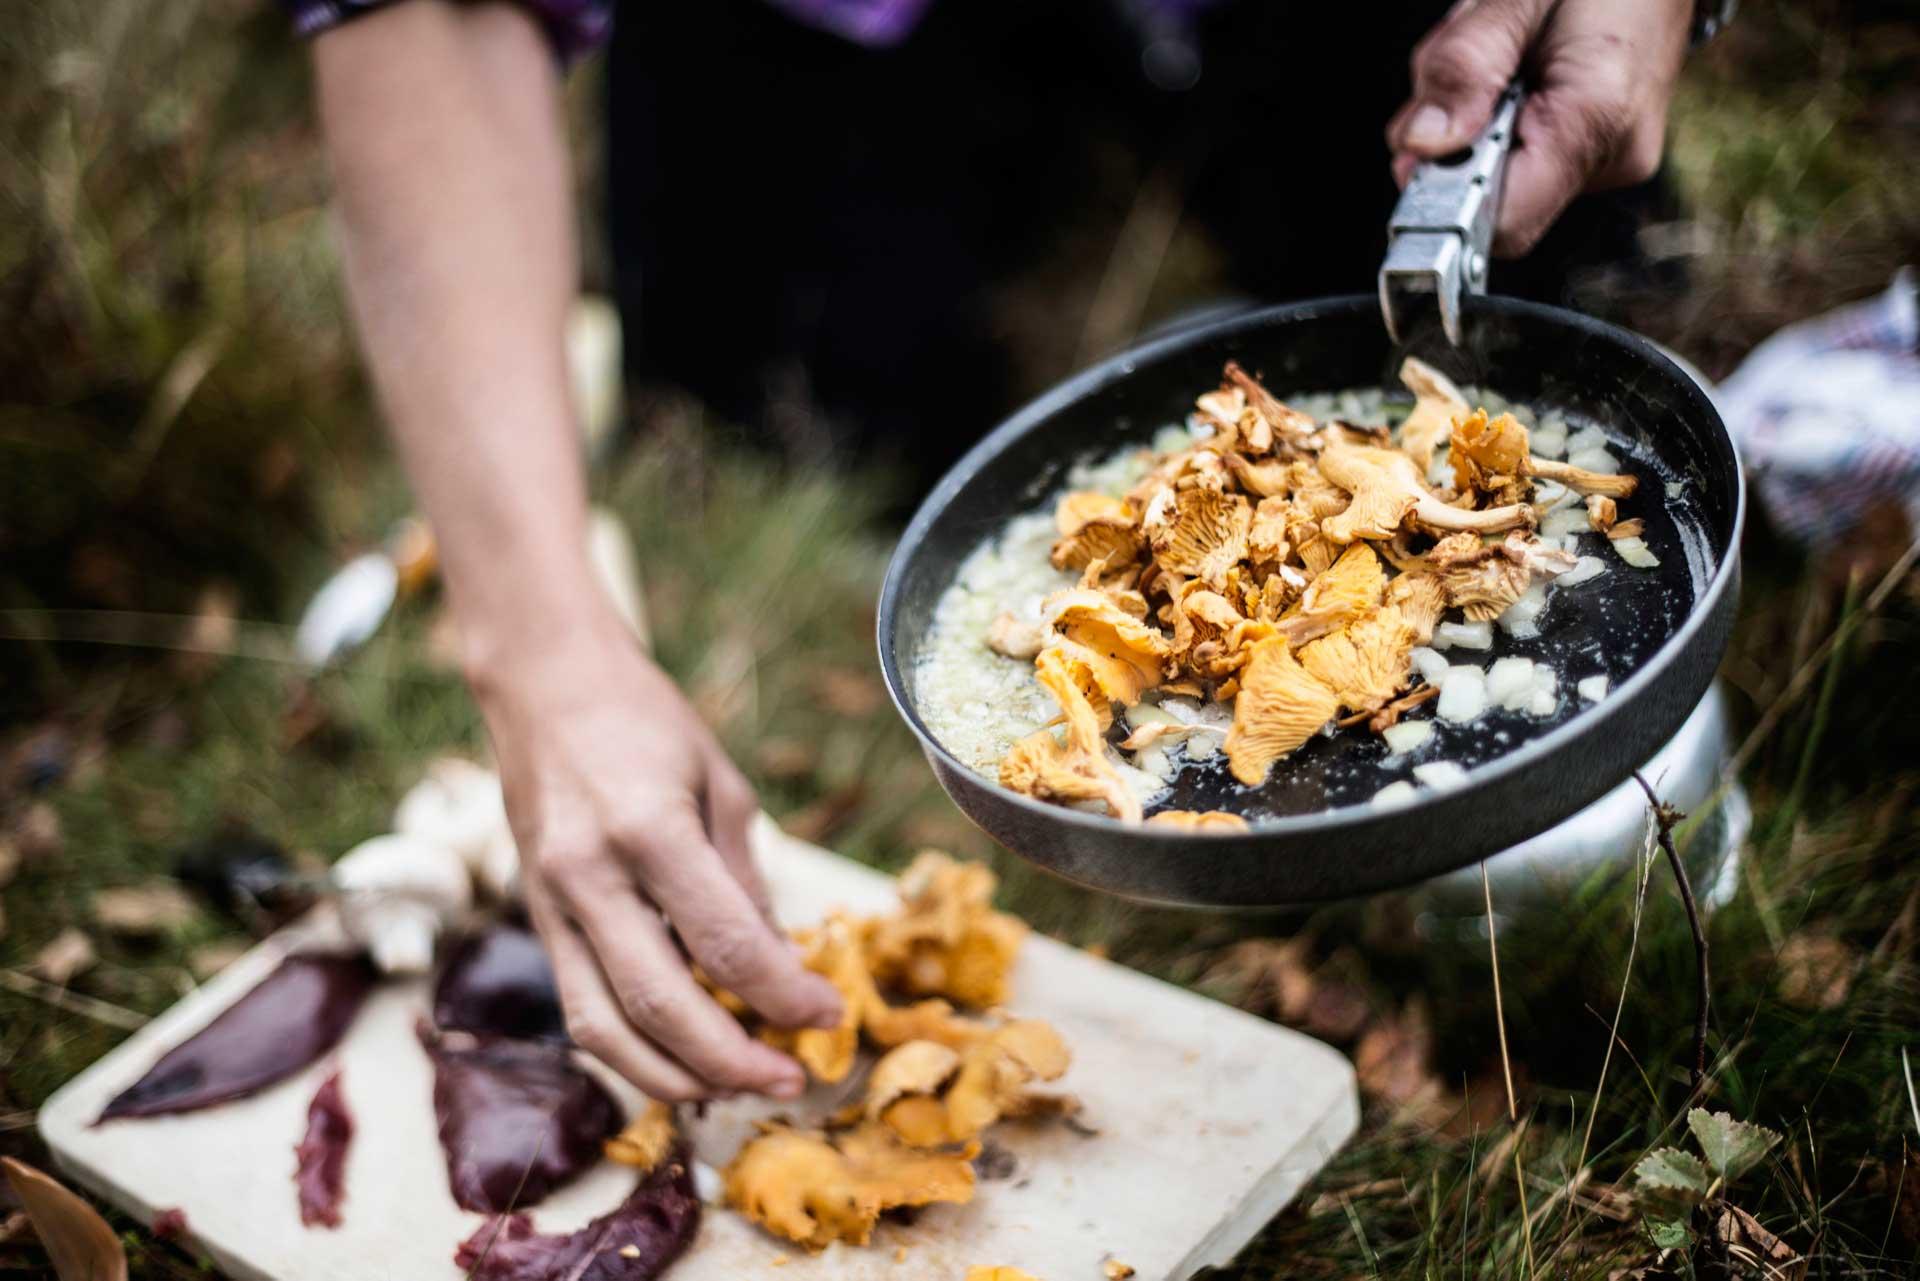 Outdoor cooking Sweden | Photo: Sandra Lee Pettersson